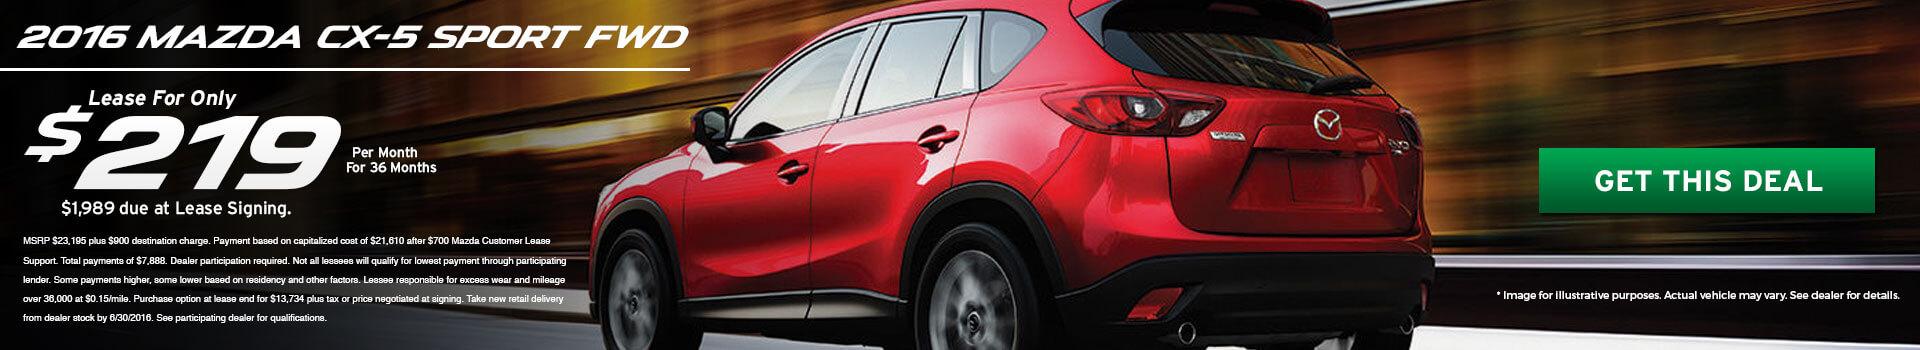 37 New Mazda Cx 5 In Stock Serving San Diego Chula Vista